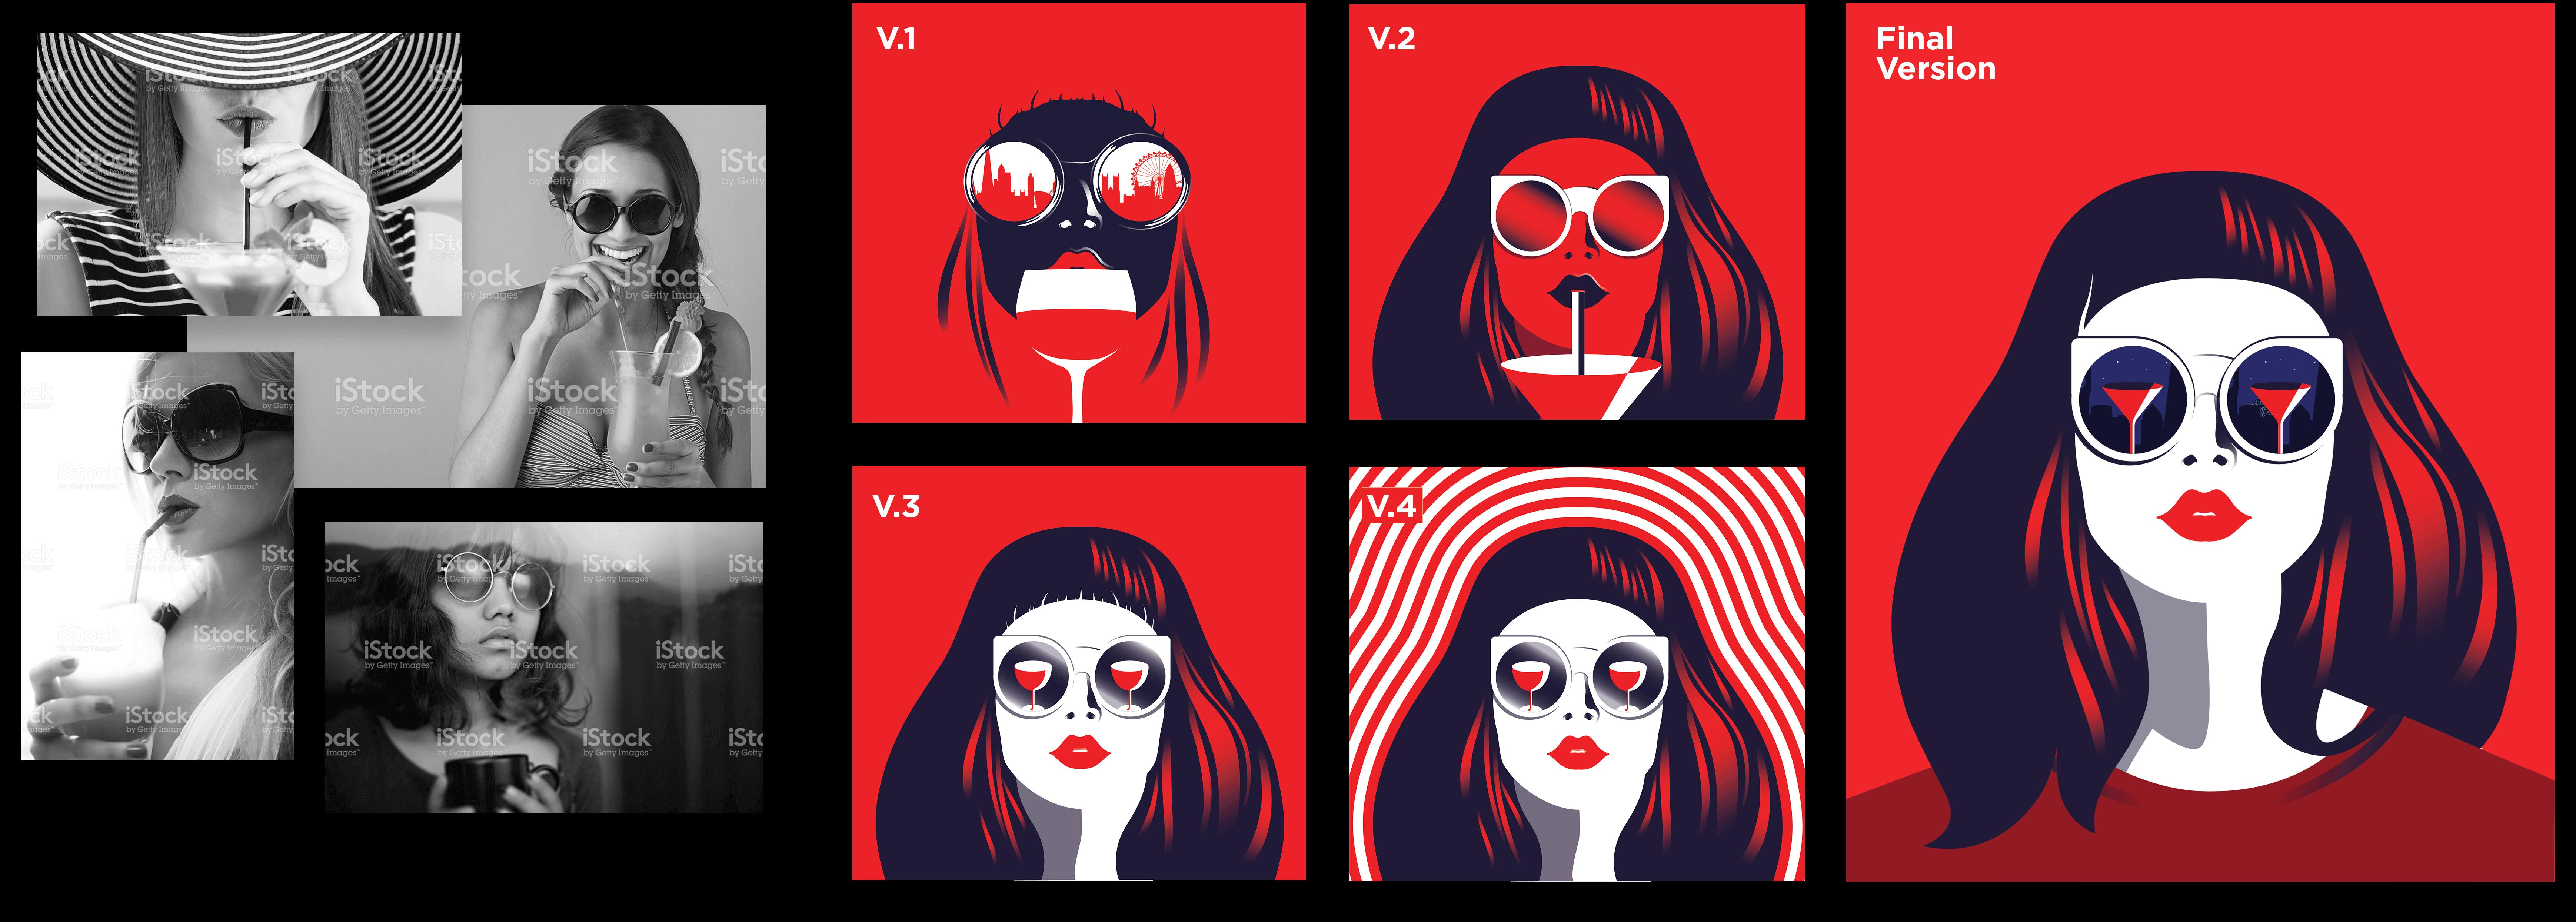 girl versions